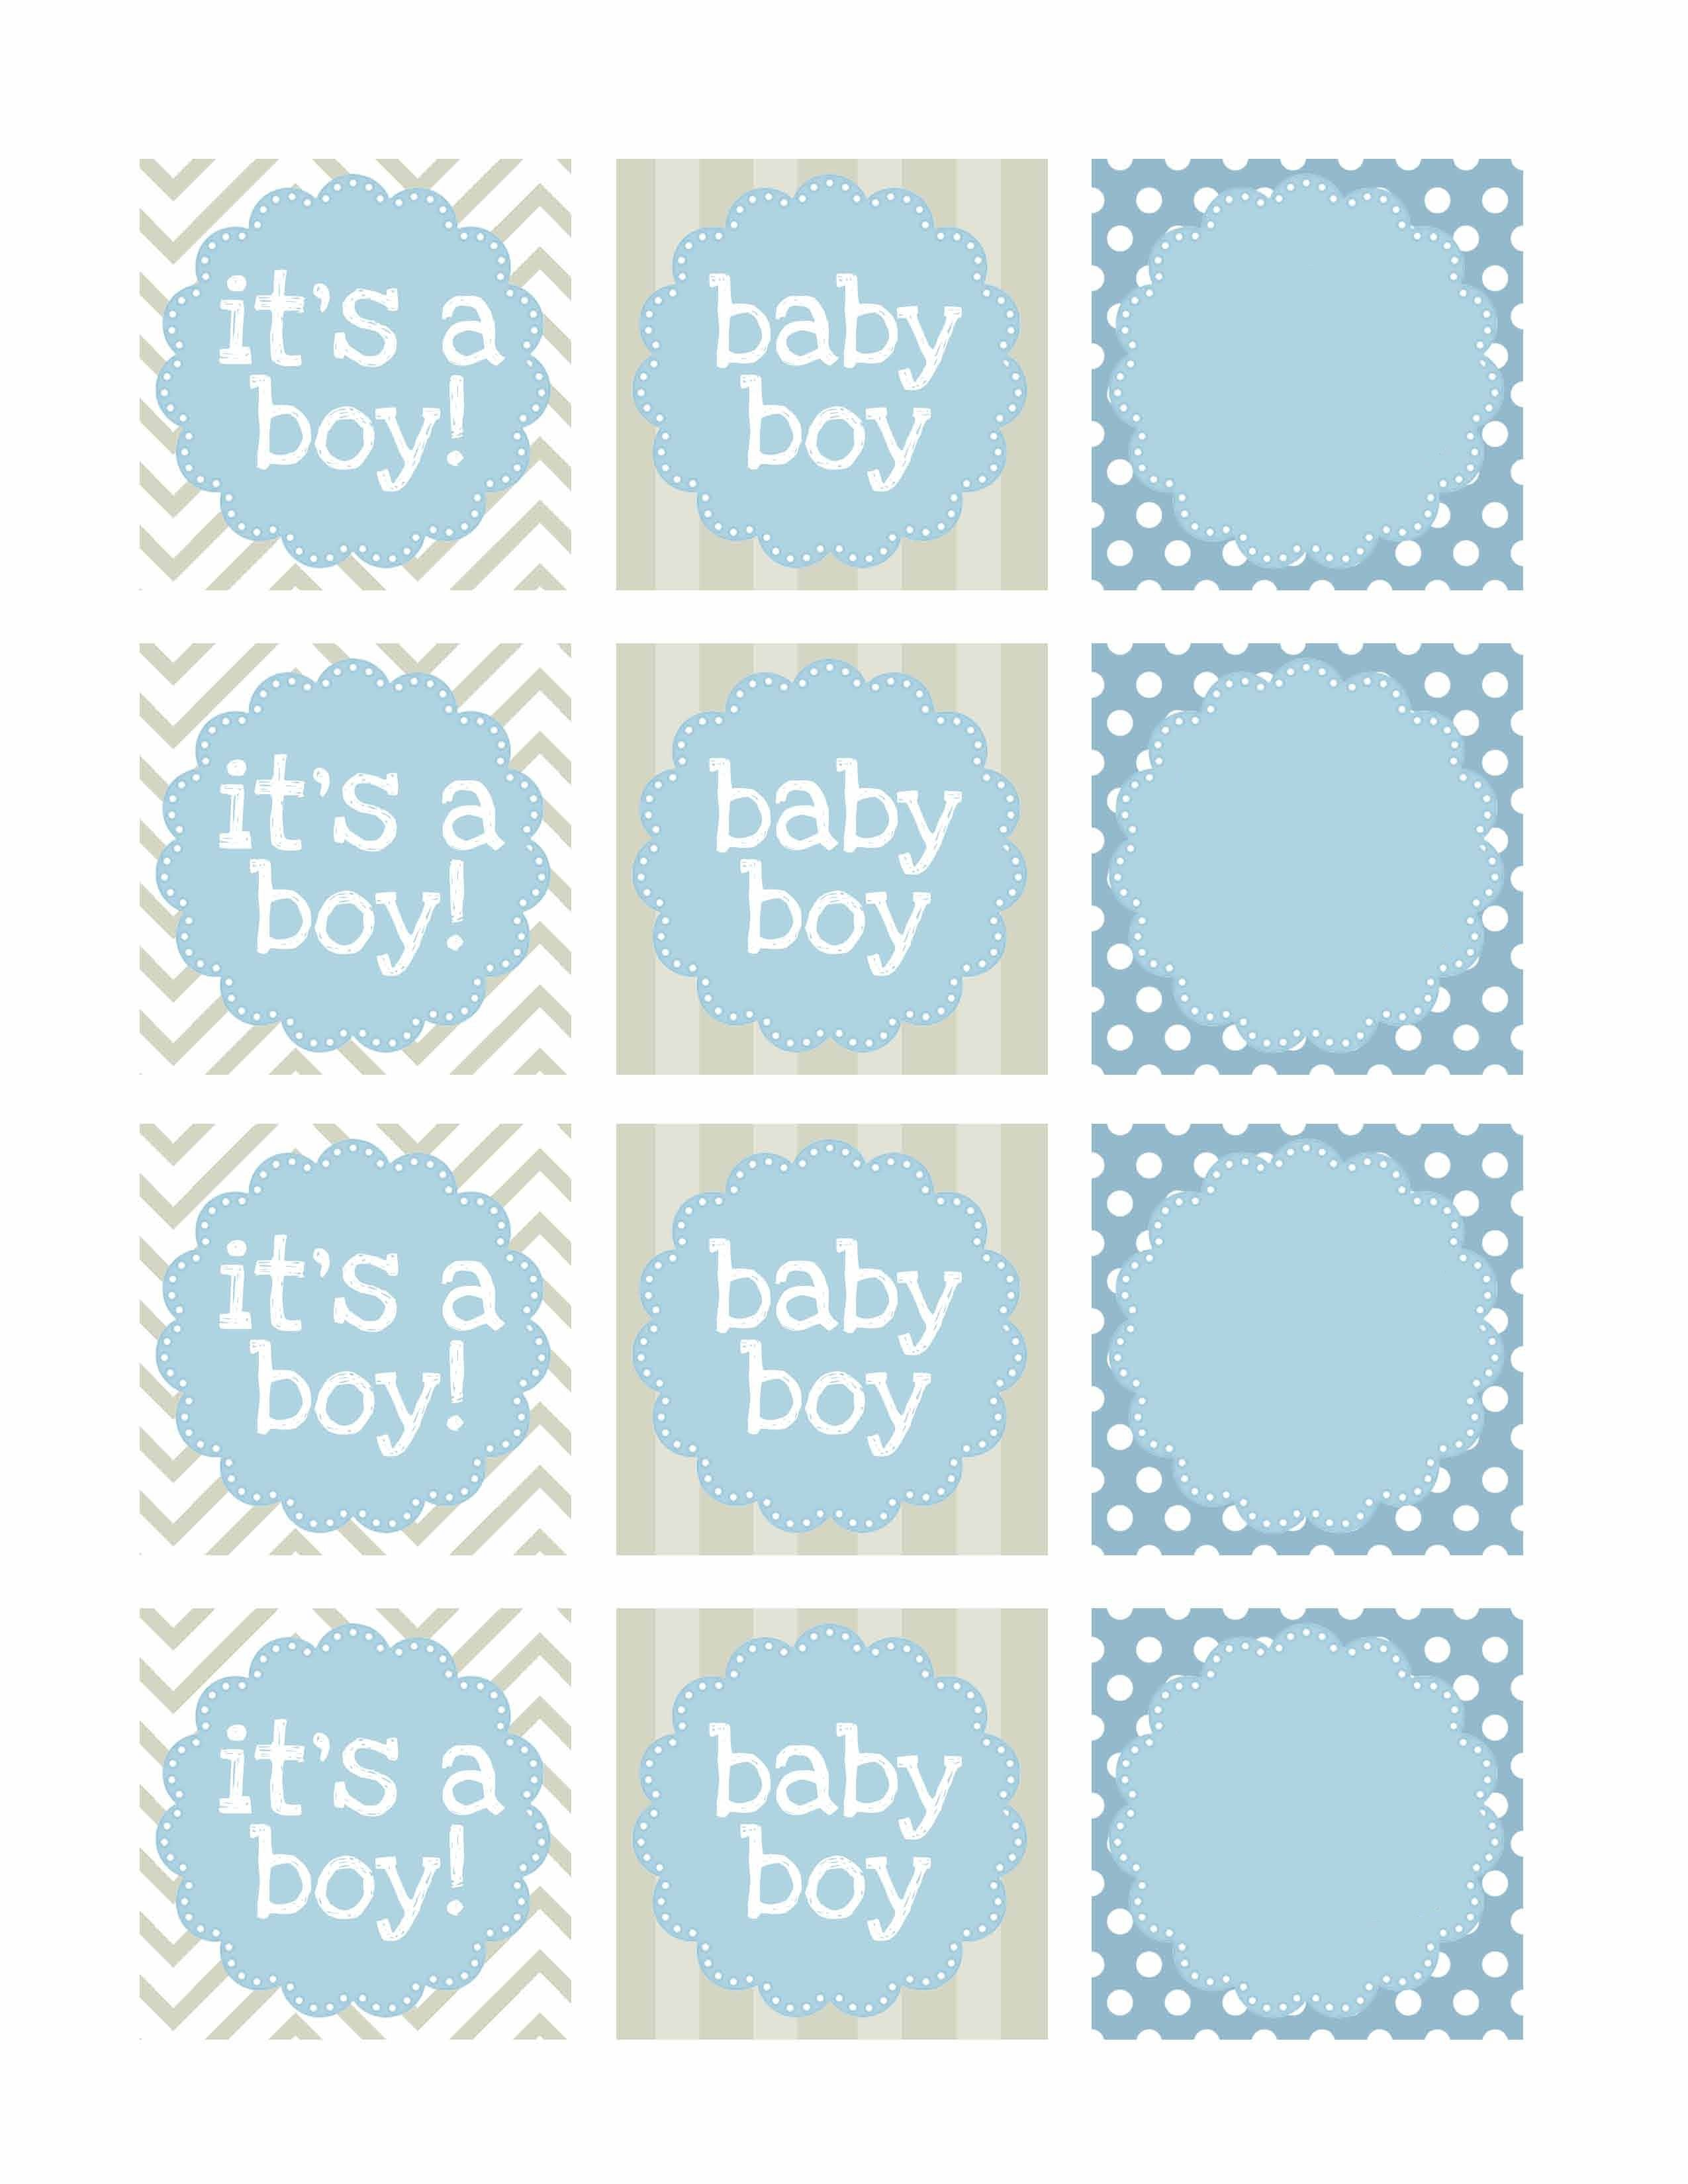 Boy Baby Shower Free Printables   Printable   Návody, Nápady, Tisk - Free Printable Baby Shower Favor Tags